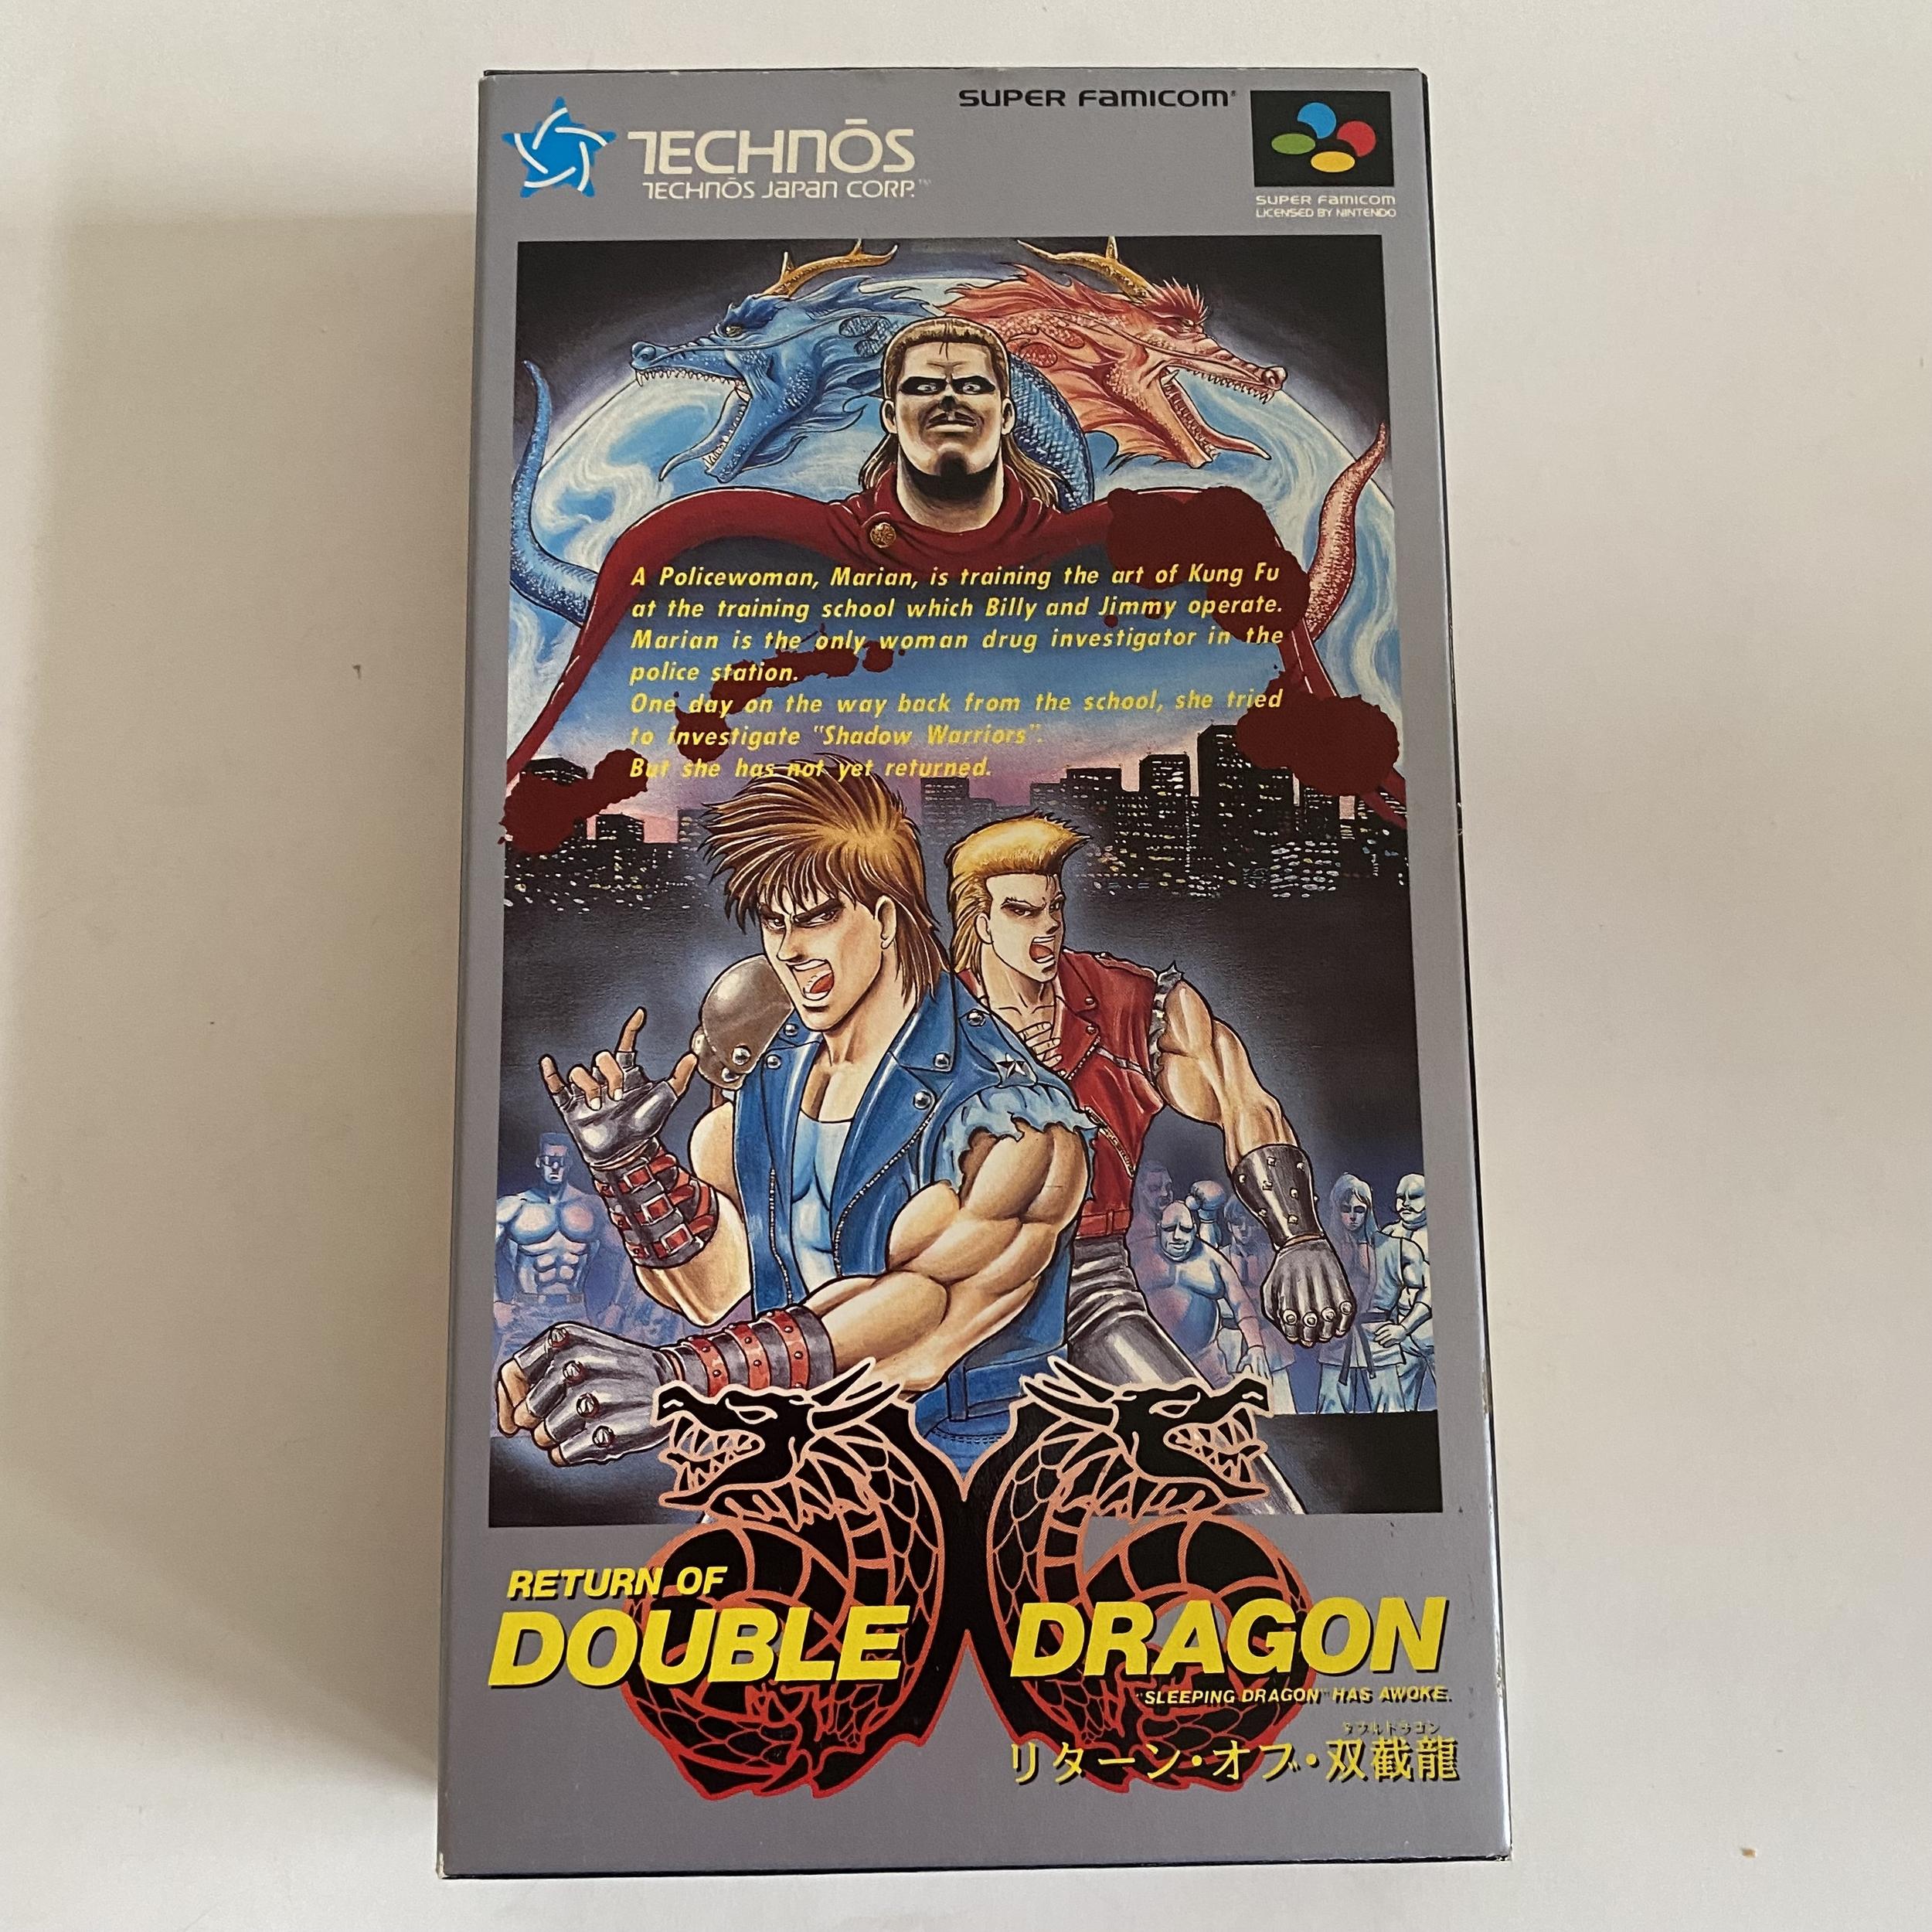 Return of Double Dragon- Super Famicom